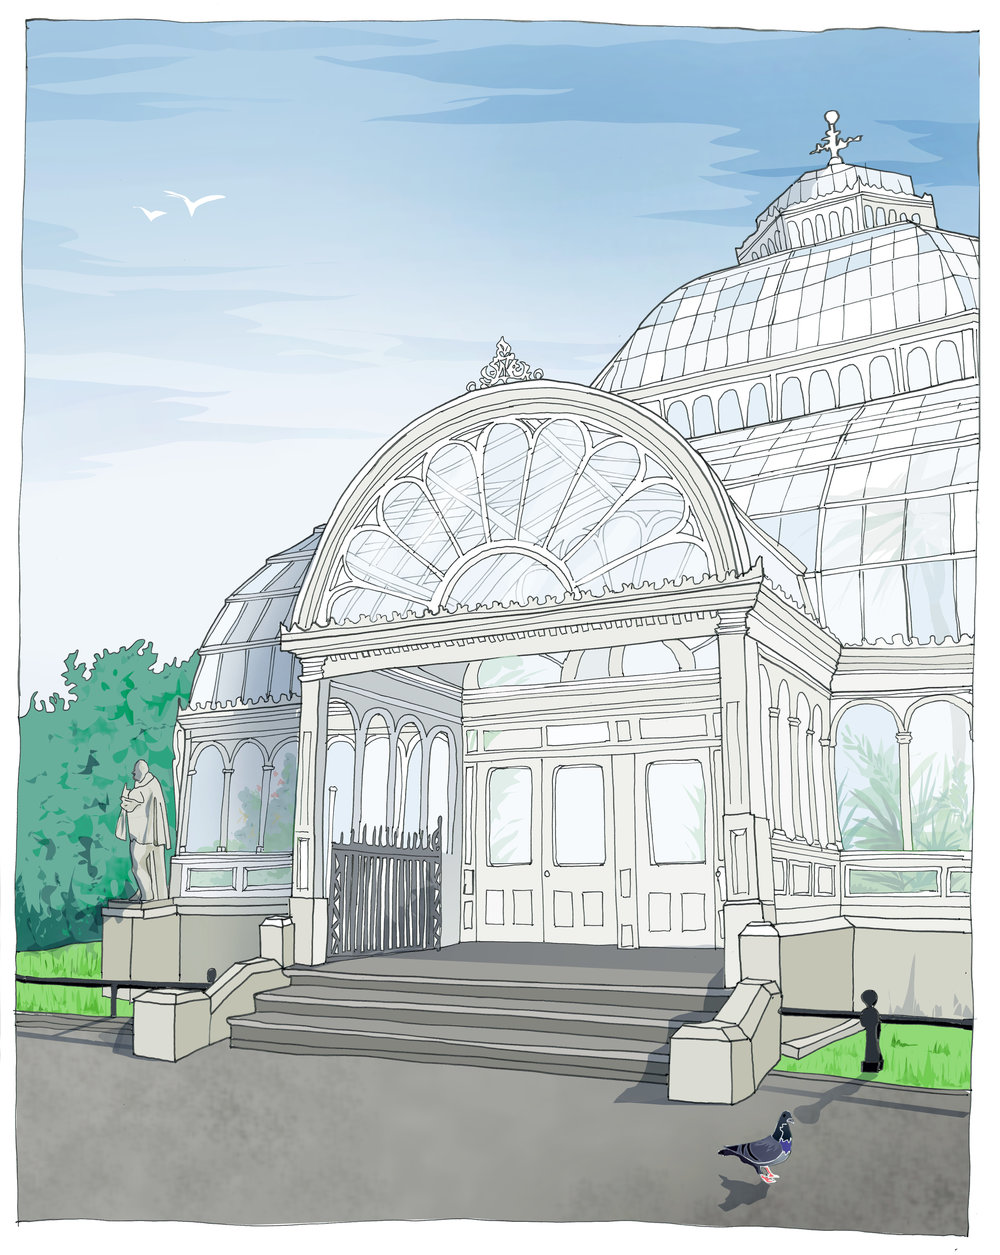 Palm House - Sefton Park, Liverpool